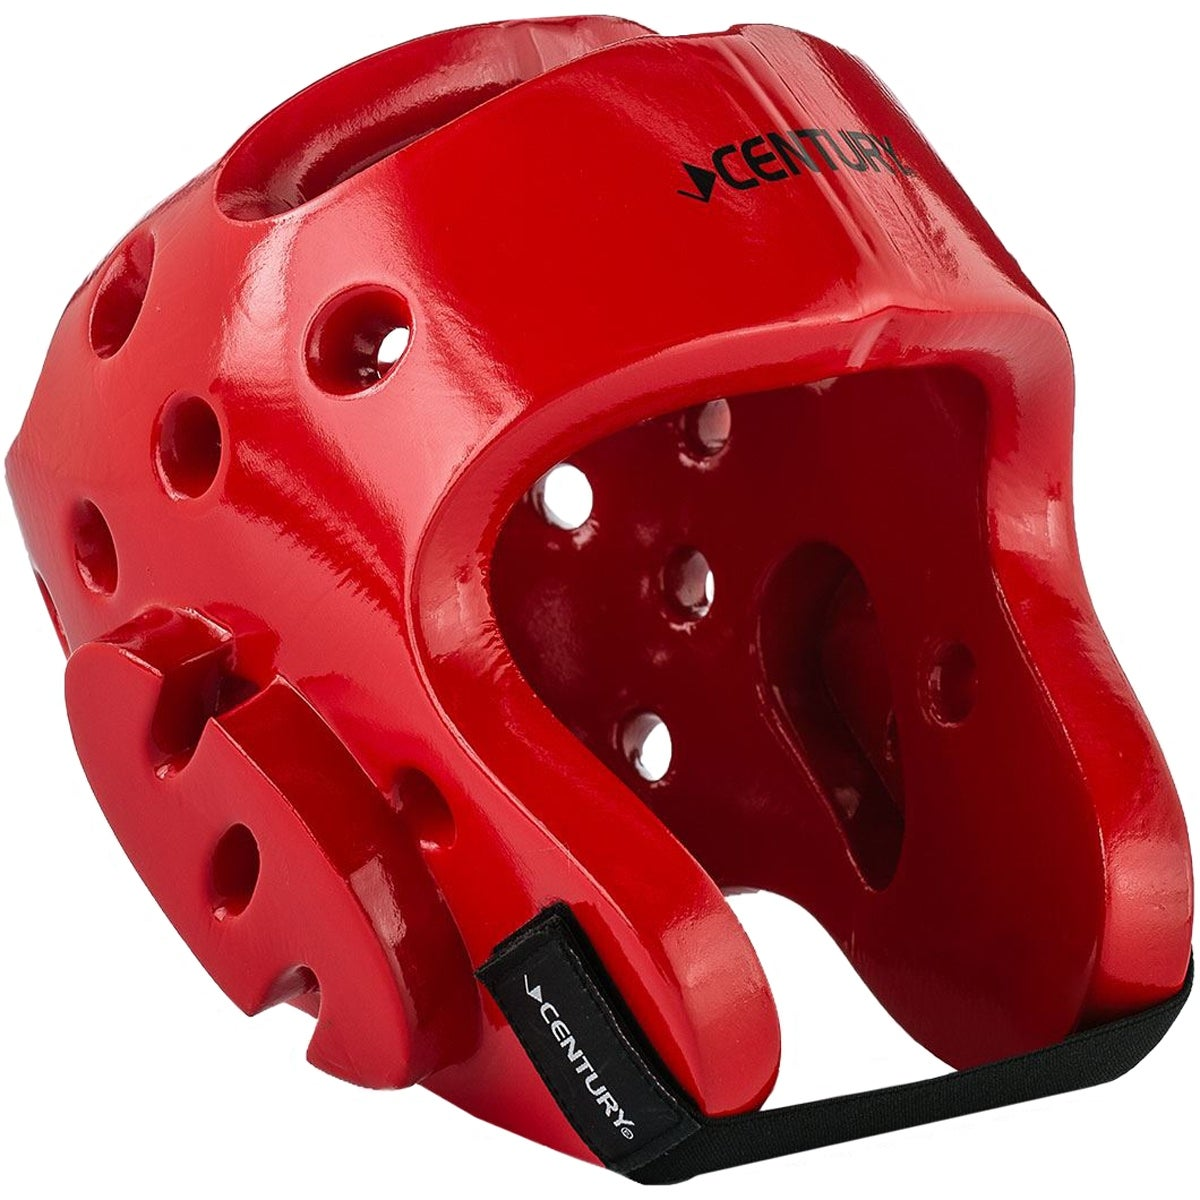 Martial Arts Protective Sparring Head Gear Taekwondo Karate MMA Boxing Helmet